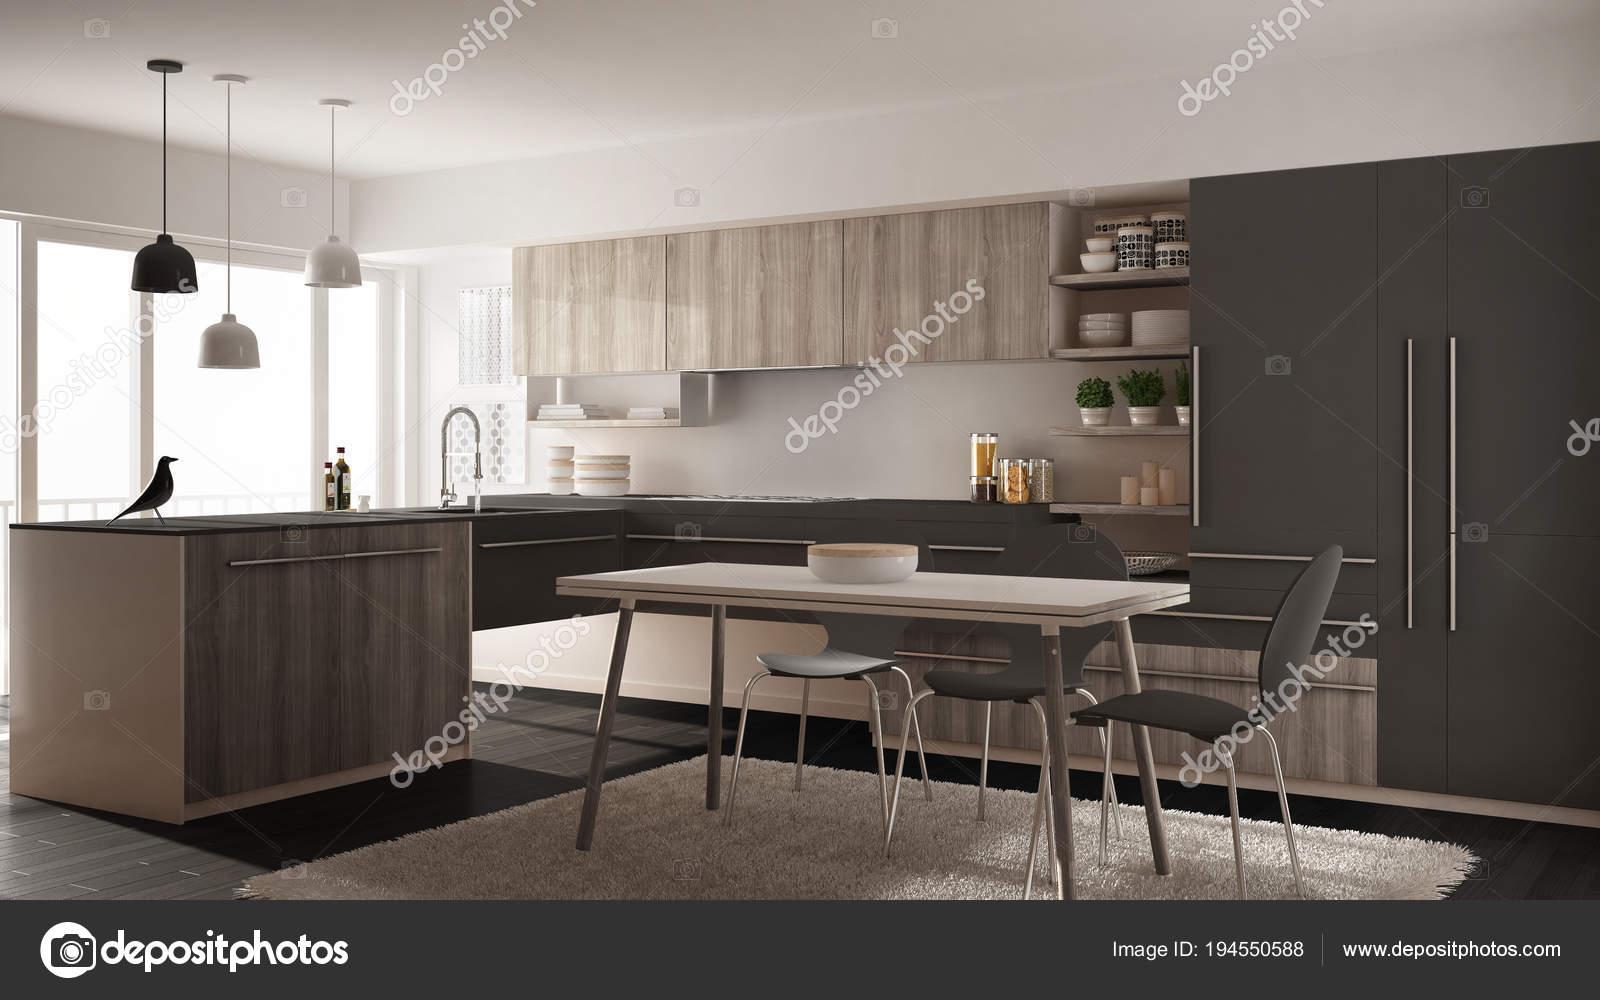 grey kitchen rugs fans with lights 现代简约木制厨房配有餐桌 地毯 全景窗 白灰色建筑室内设计 图库照片 白灰色